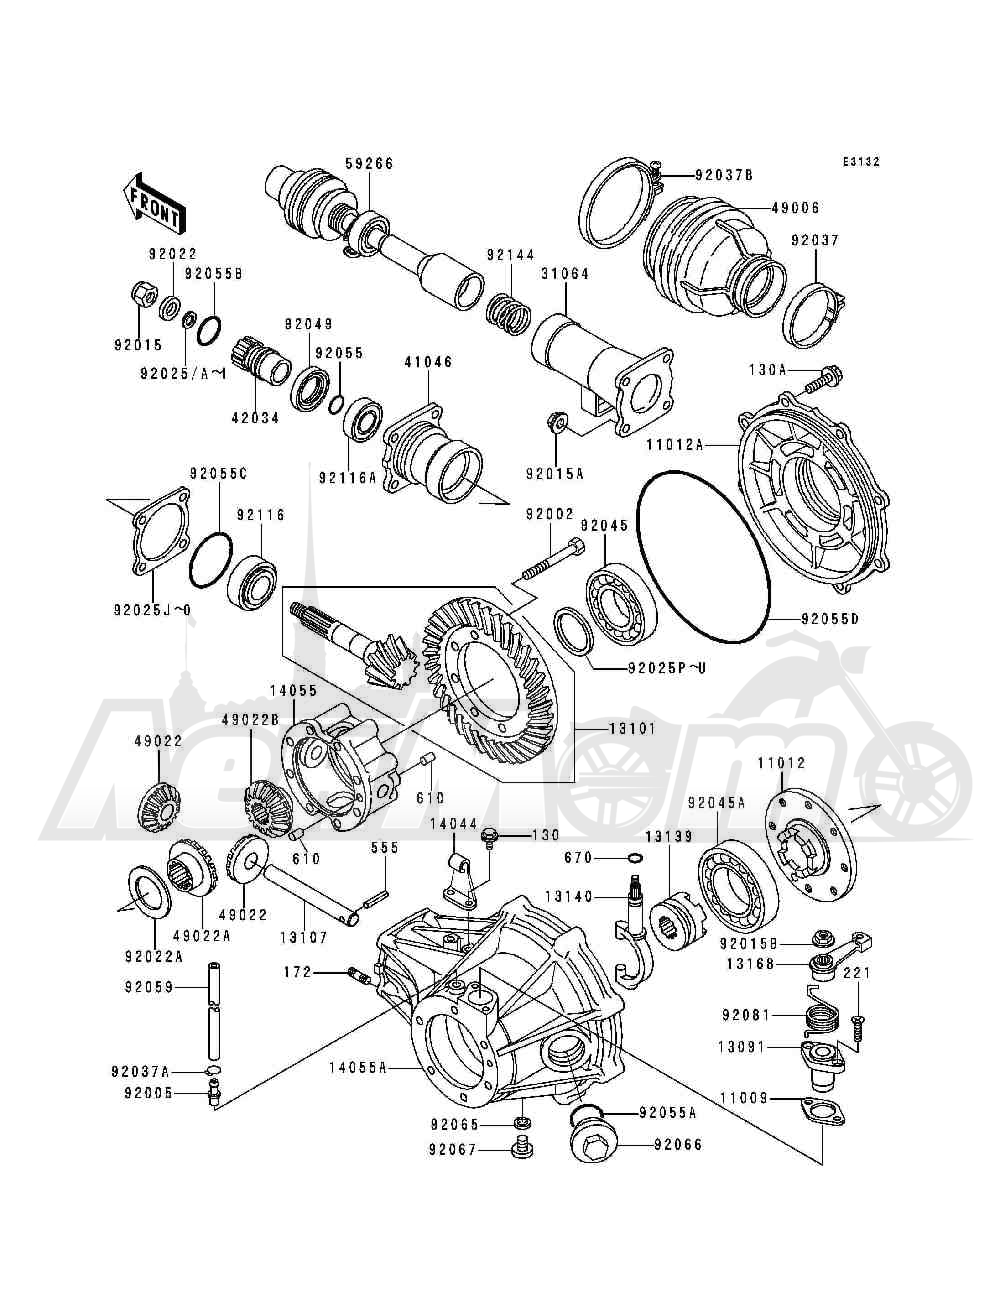 Запчасти для Квадроцикла Kawasaki 1993 BAYOU 300 (KLF300-B6) Раздел: DRIVE SHAFT / FINAL GEAR   приводной вал/FINAL шестерня